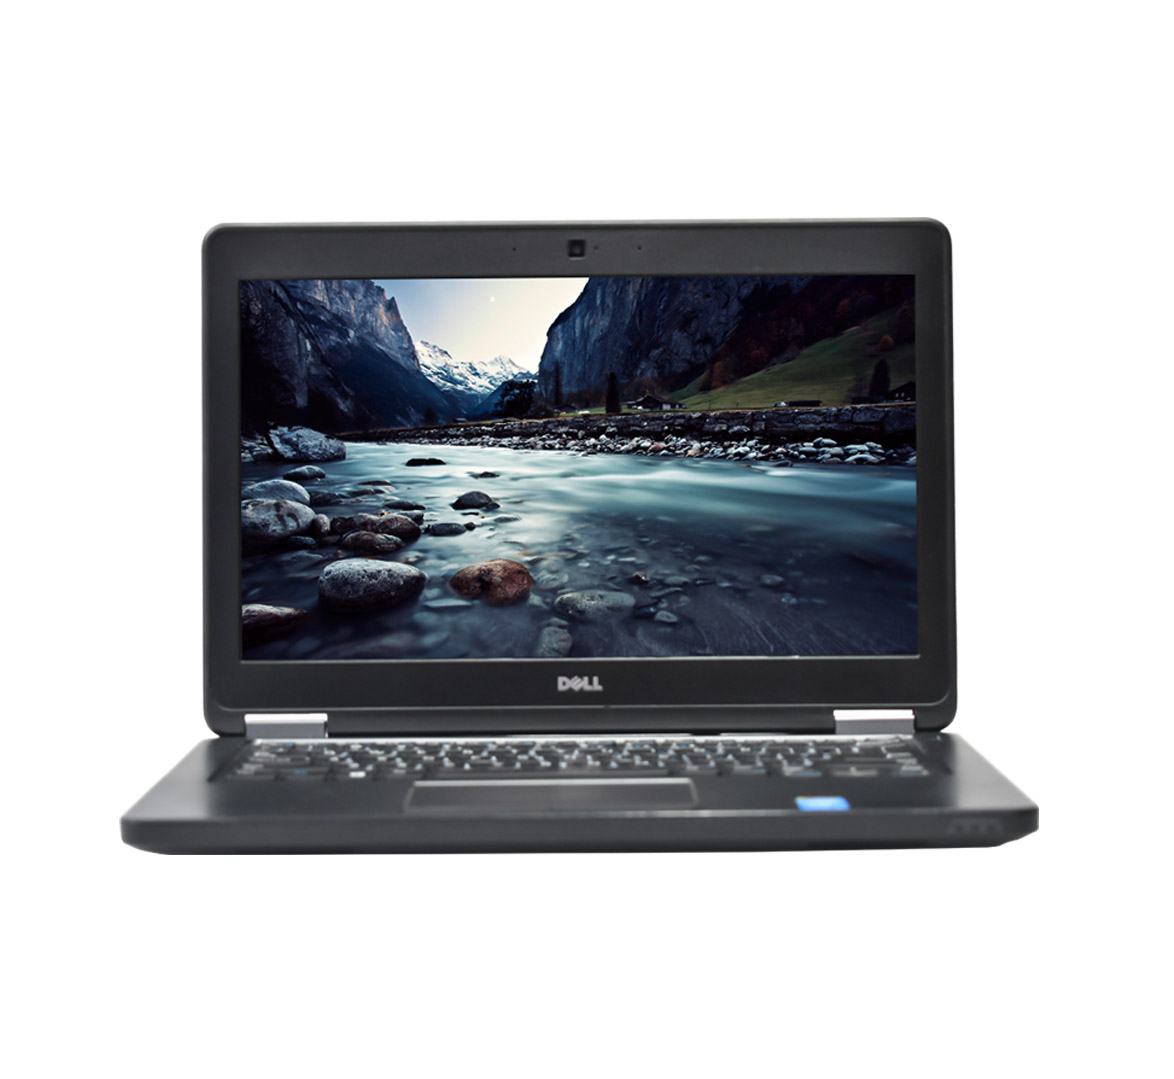 Dell Latitude E5250 Business Laptop, Intel Core i5-5200U CPU, 8GB DDR3L SODIMM RAM, 256GB SSD 2.5, 12 inch Display, Windows 10 (Refurbished)